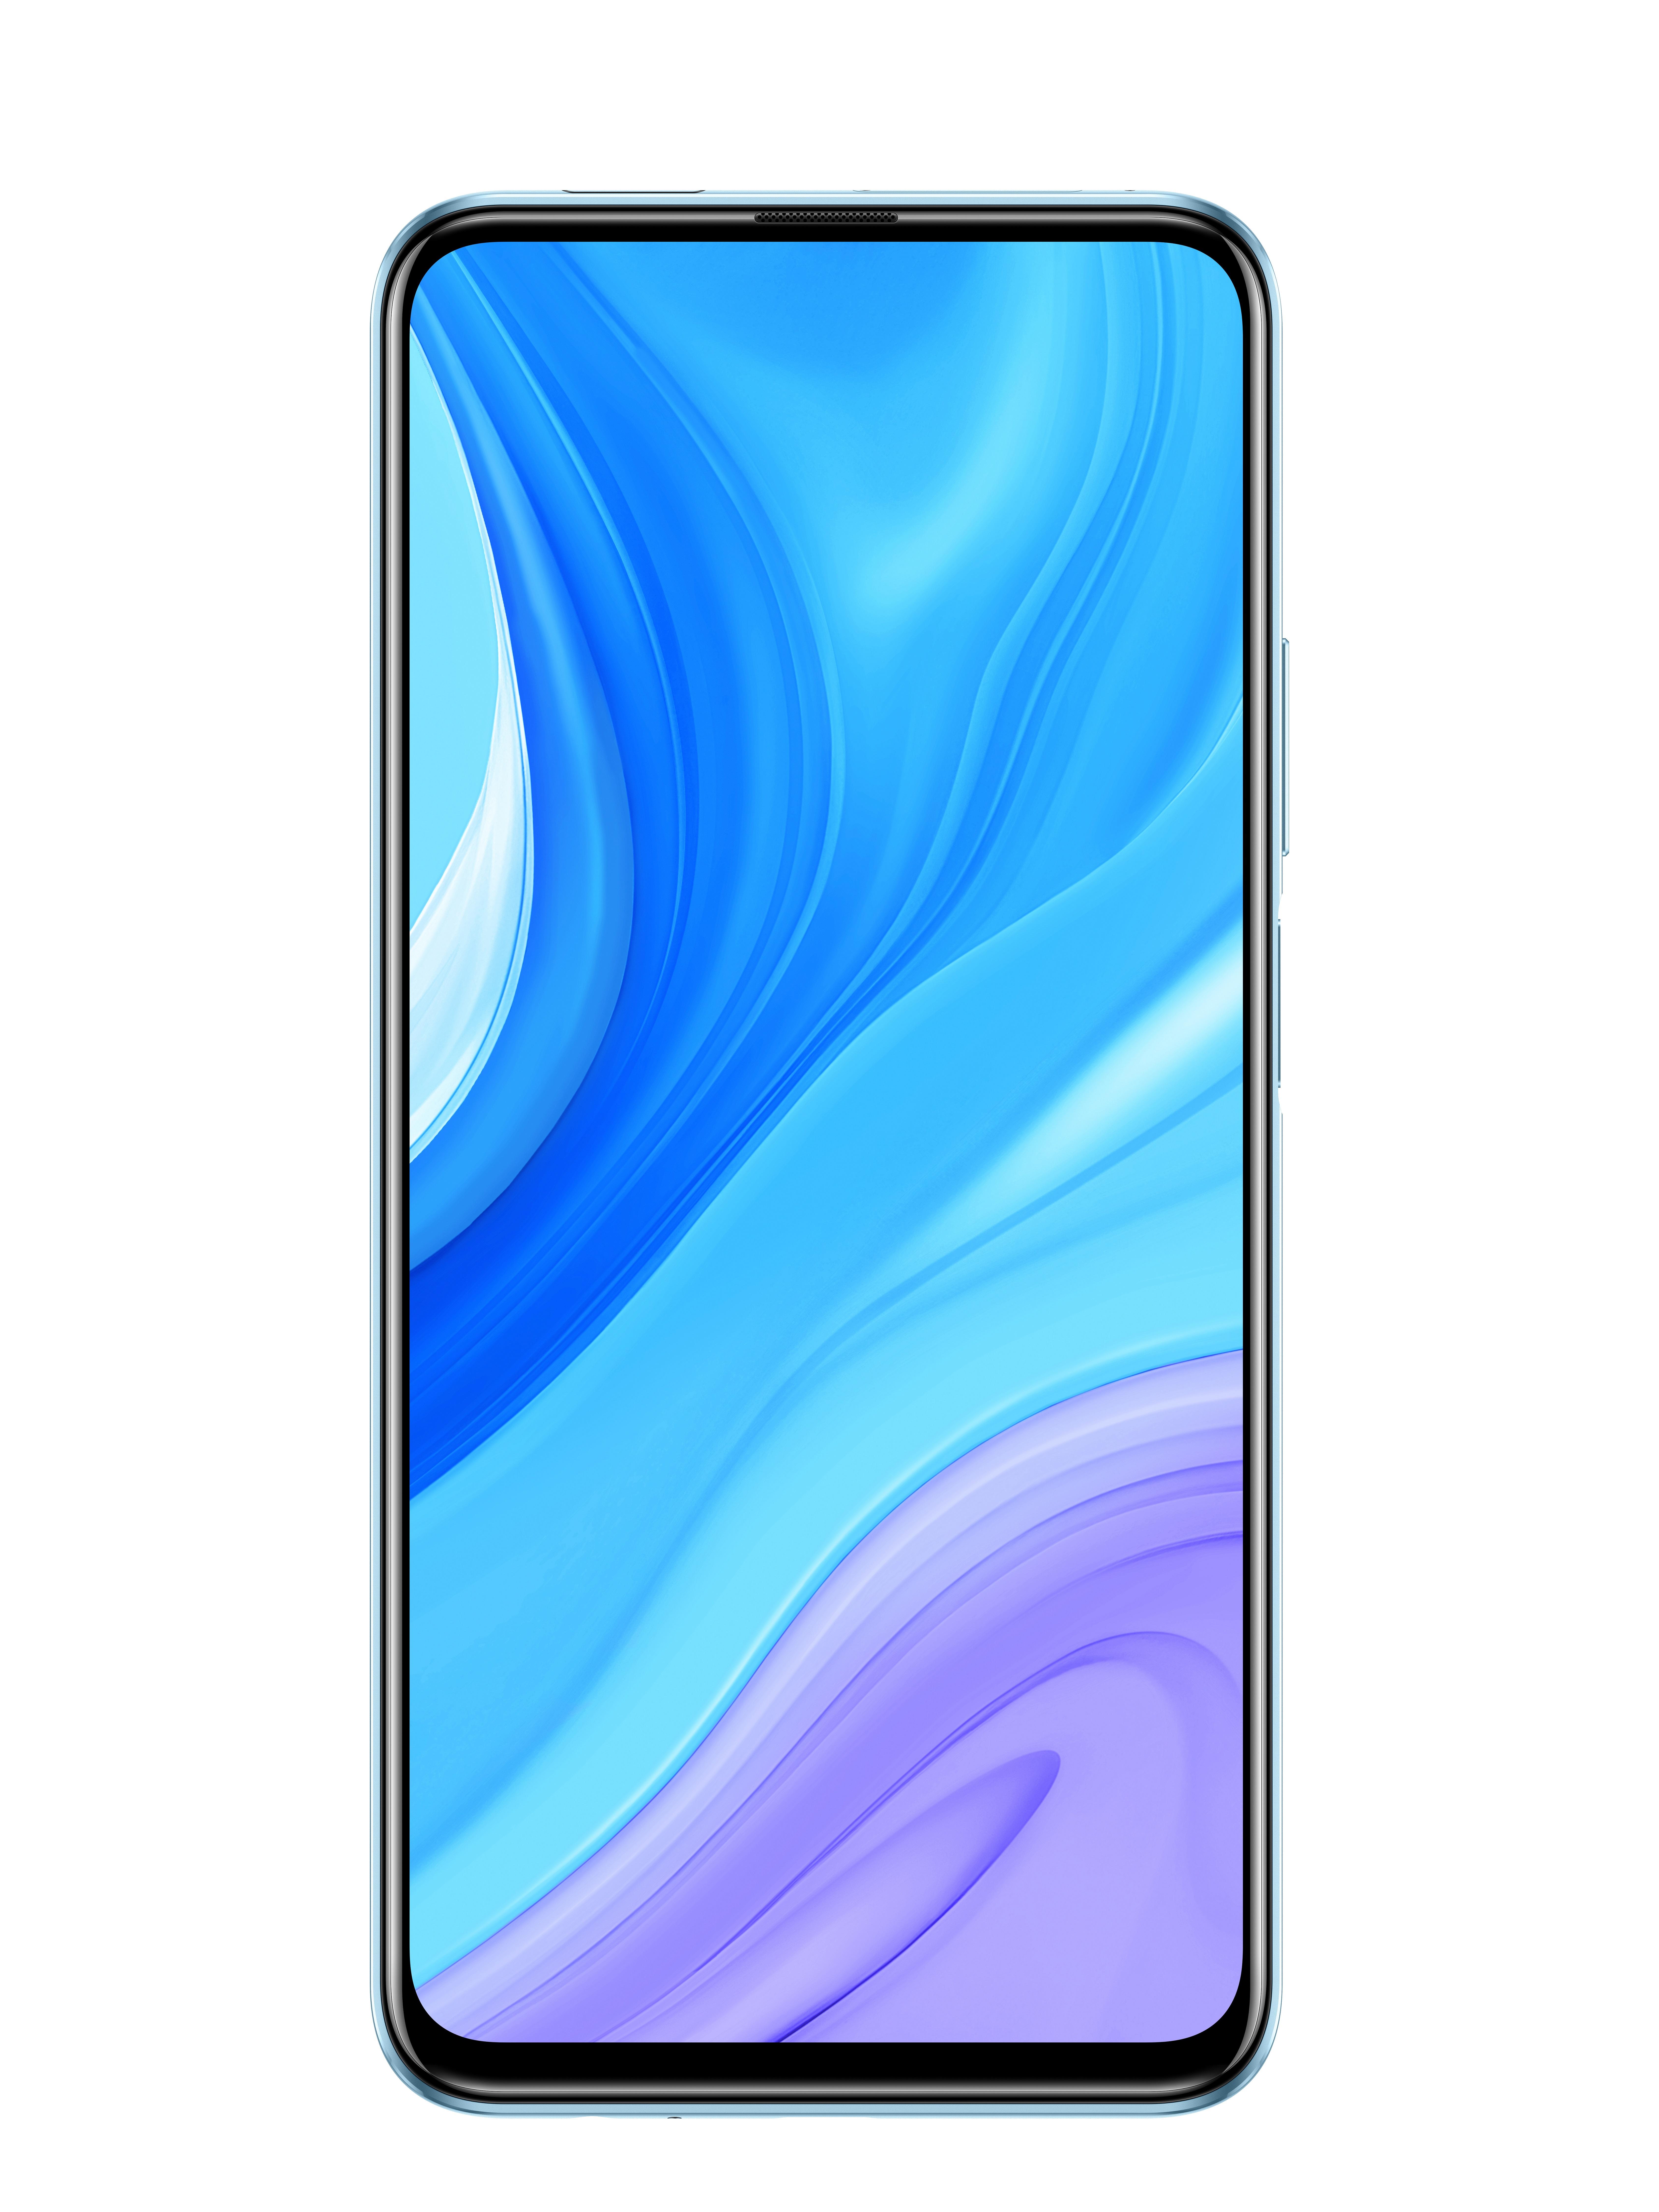 "Huawei Display: 6.59"" FHD+ (2310x1080) - 51095akk"